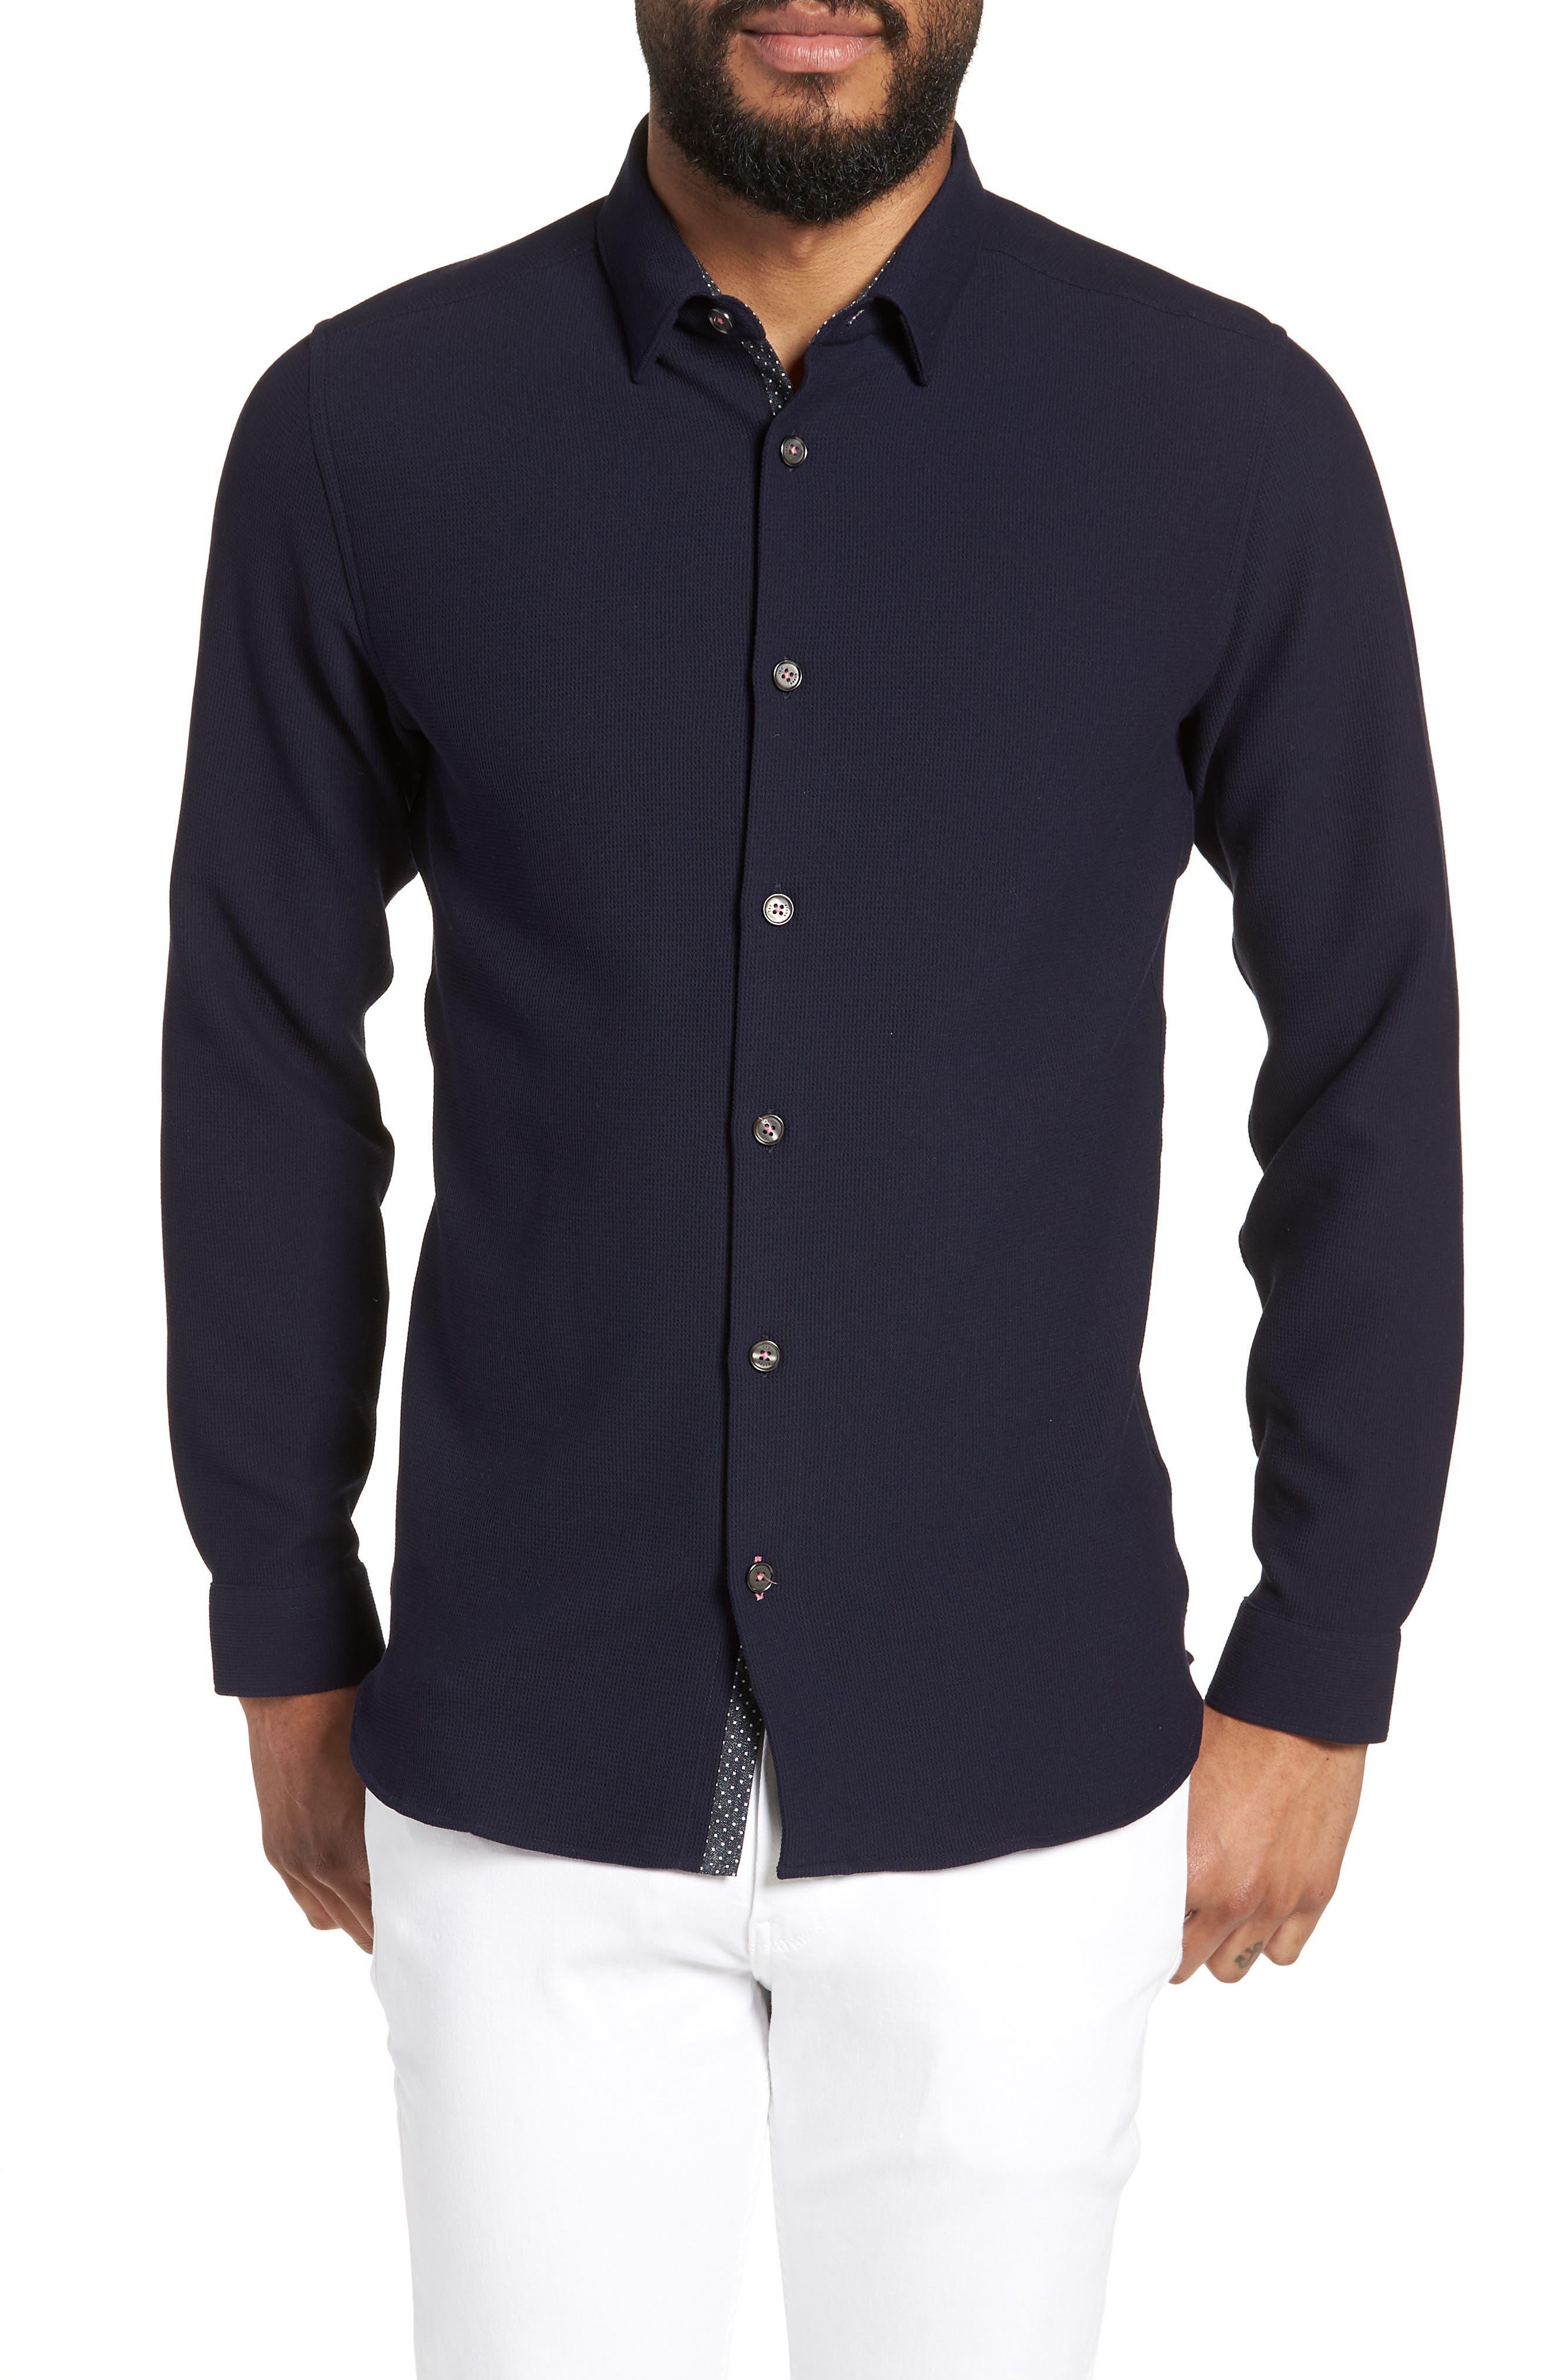 Loretax Trim Fit Stretch Knit Sport Shirt,                             Main thumbnail 1, color,                             Navy